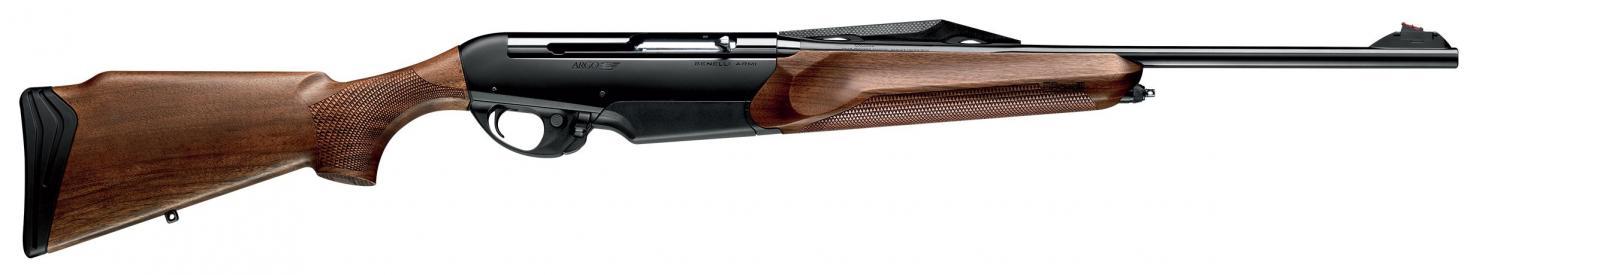 Carabine BENELLI ARGO E WOOD Cal. 30-06